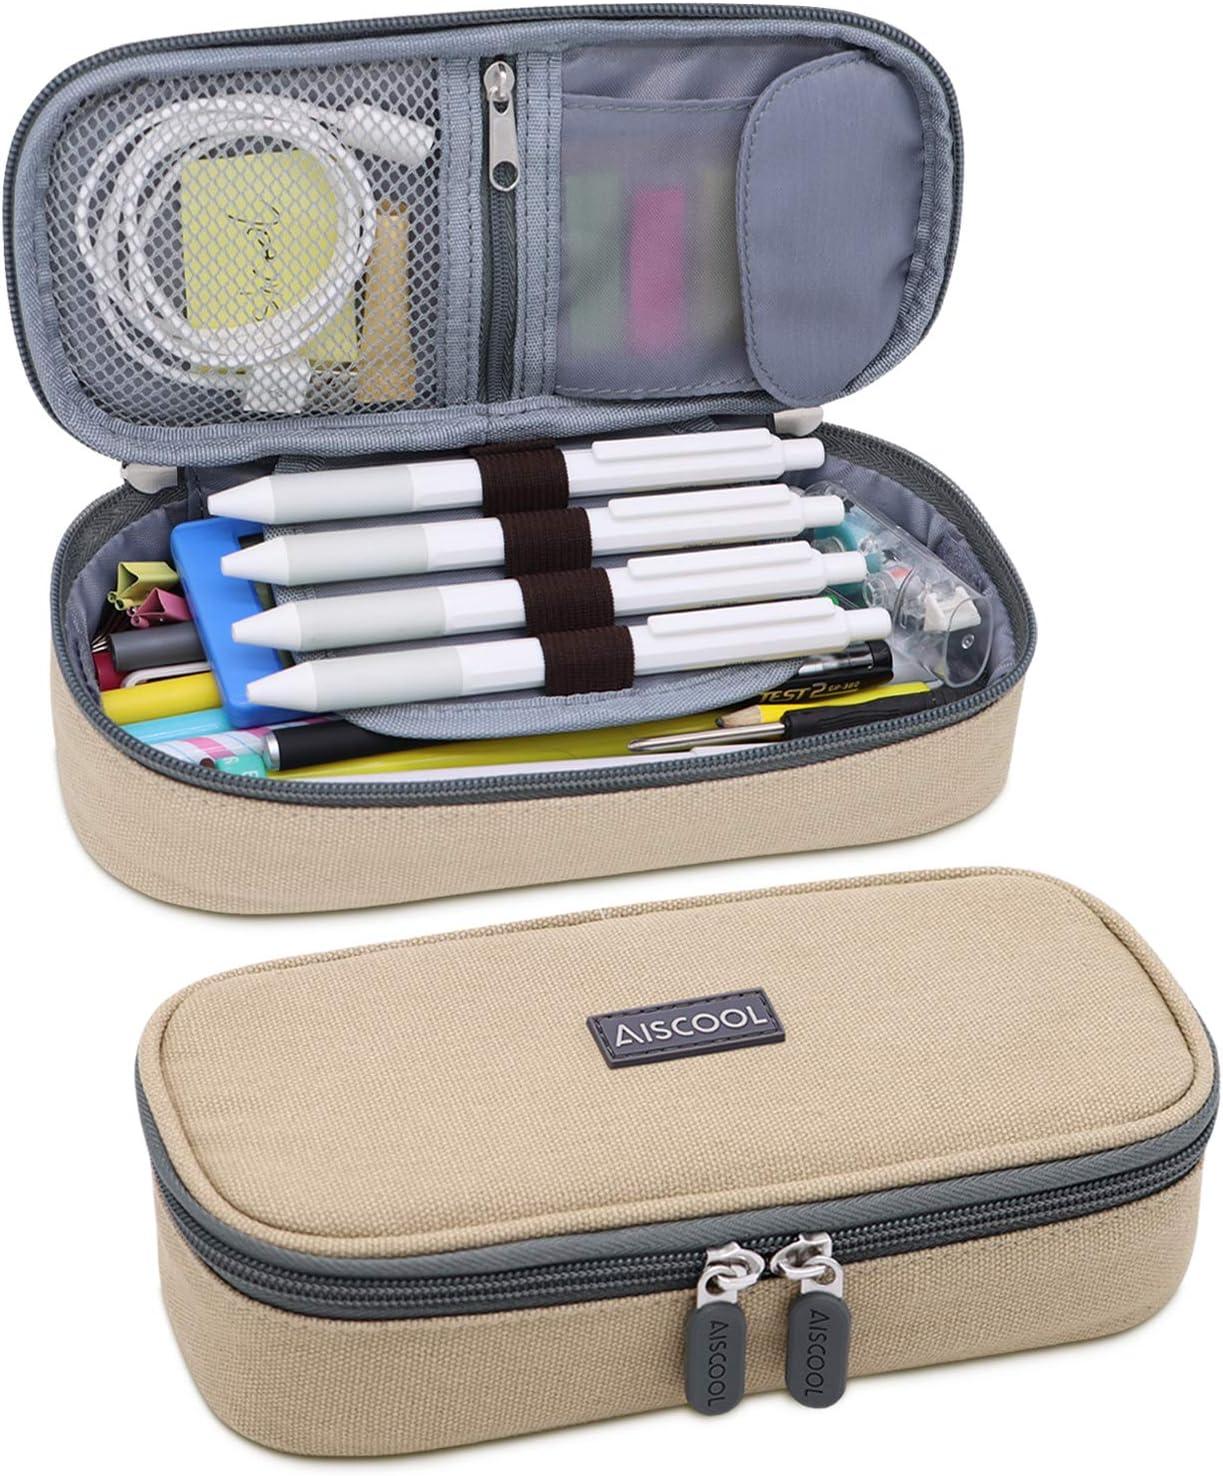 Aiscool Big Capacity Pencil Case Canvas Holder Bag Pen Organizer Pouch Stationery Box Large Storage for School Supplies School Office Stuff (Khaki)